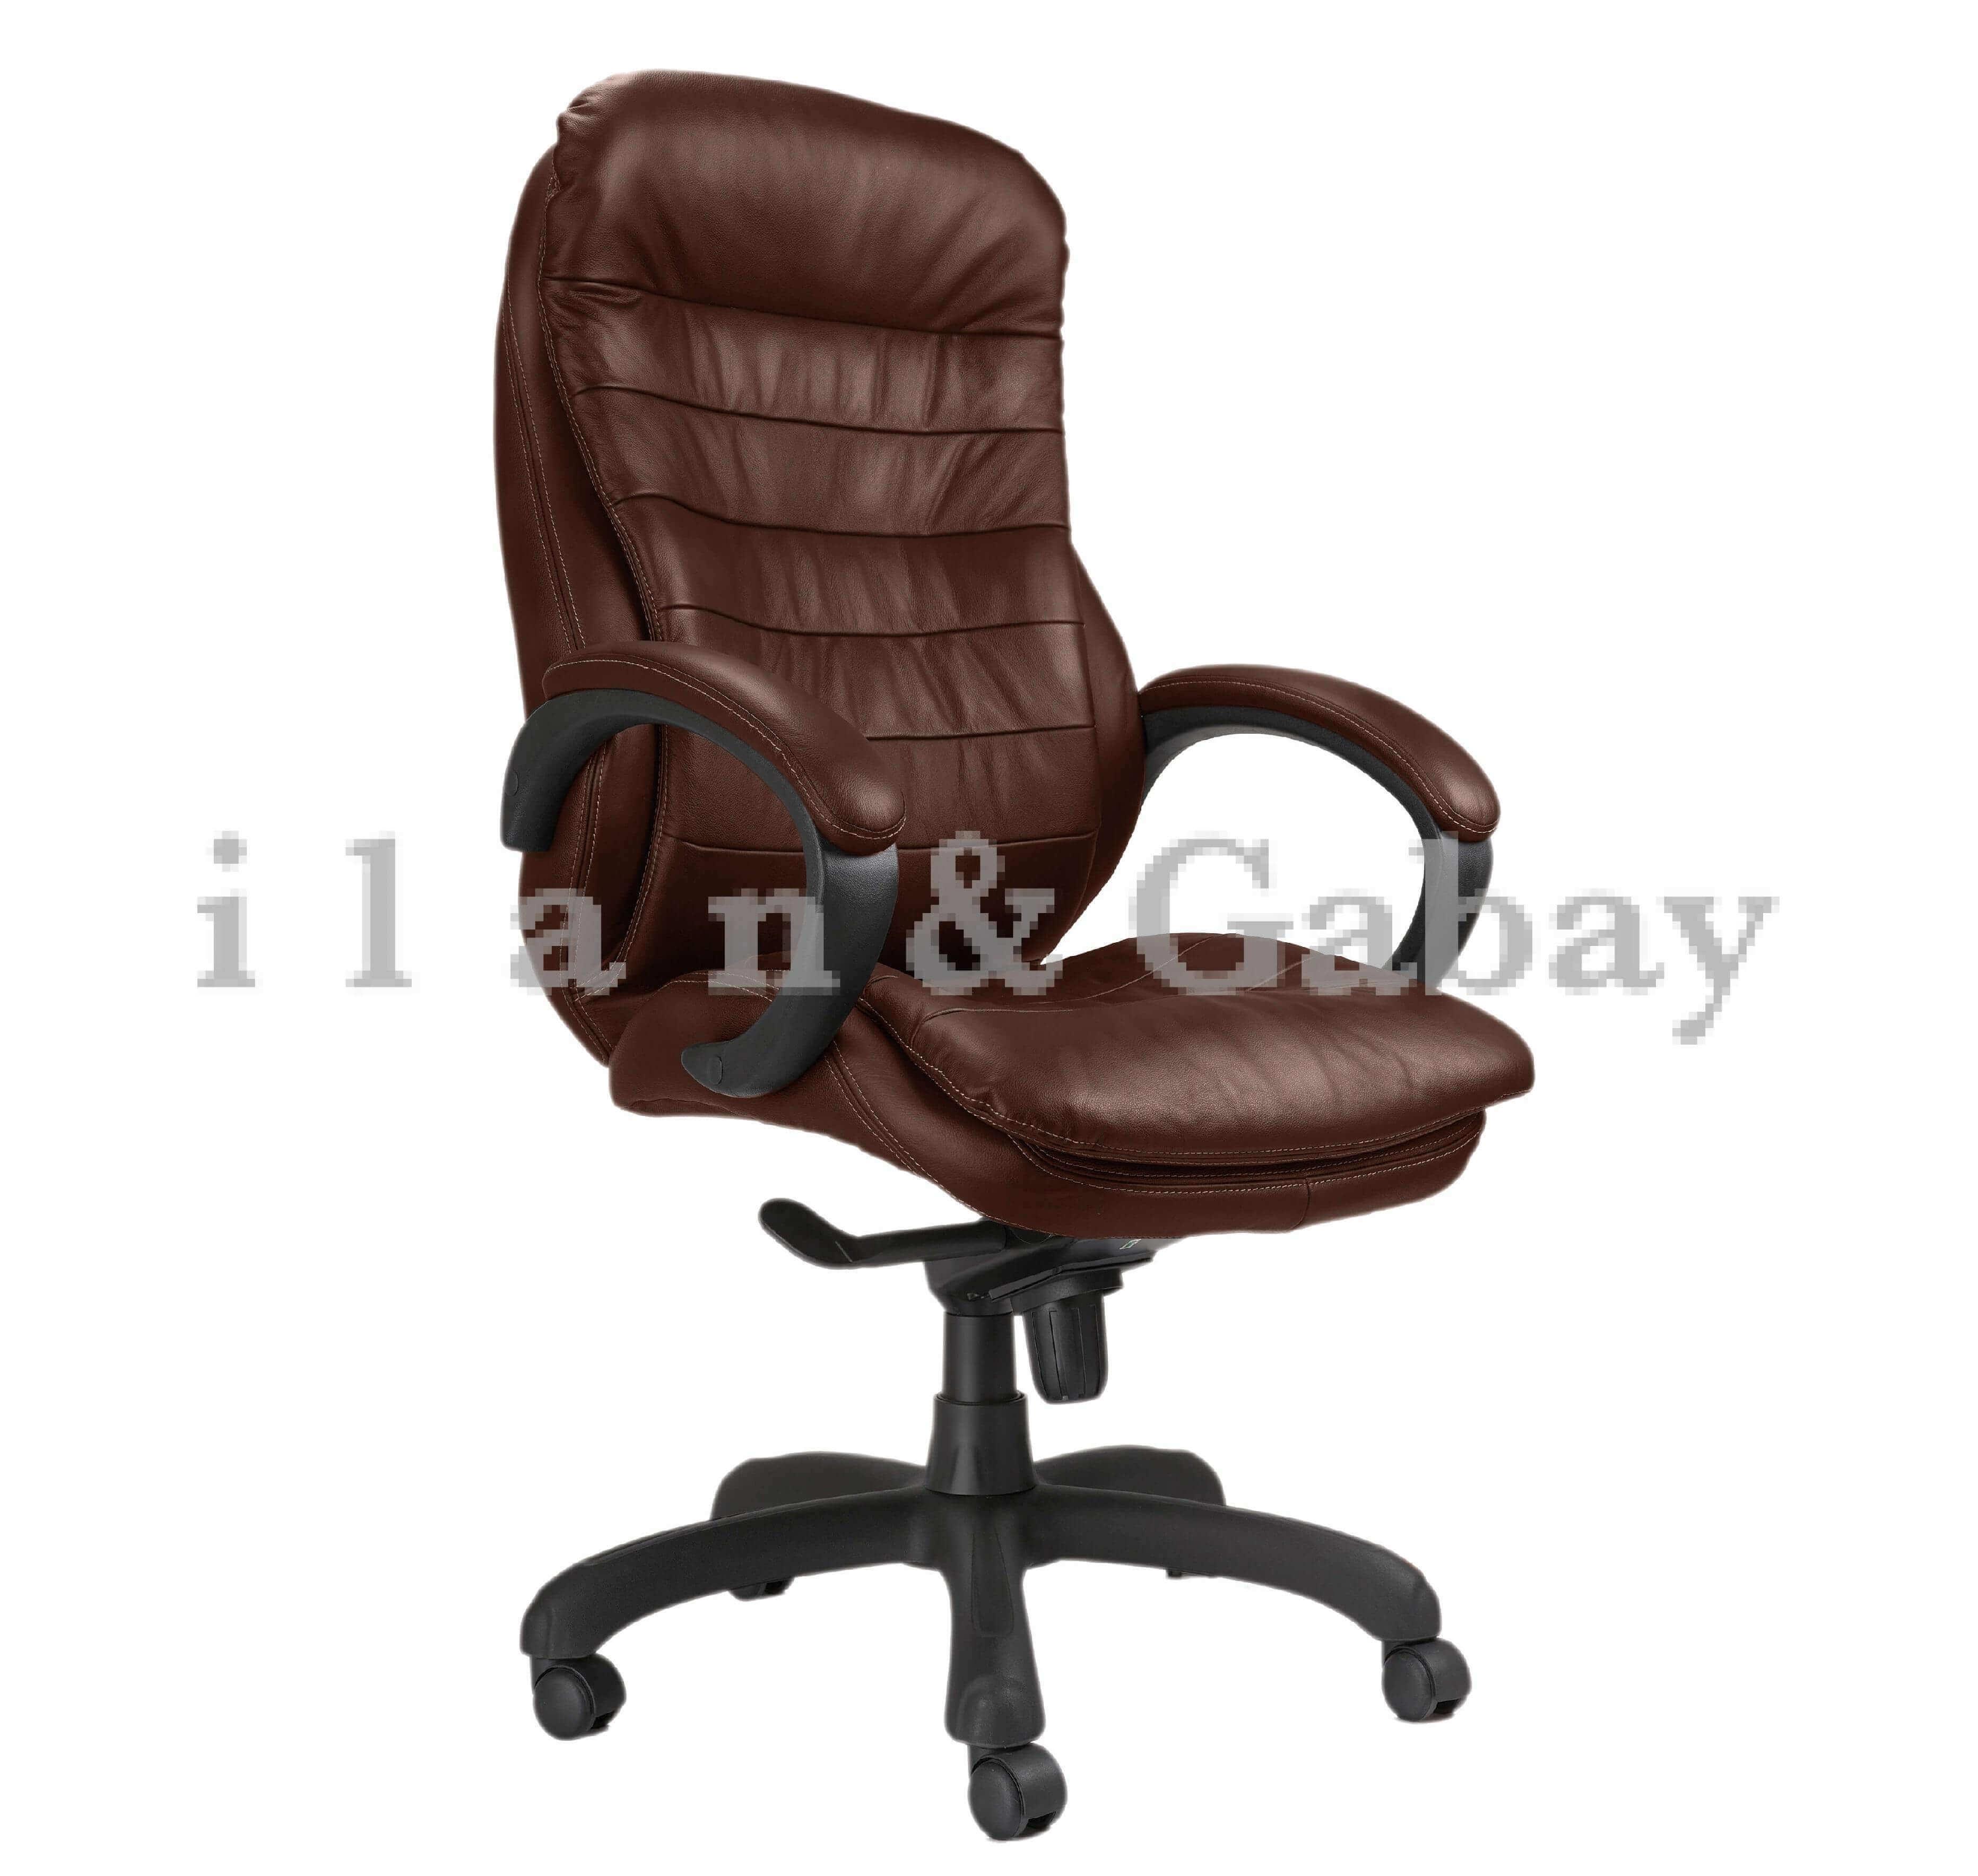 ANTONY-B כסא מנהל גבוה